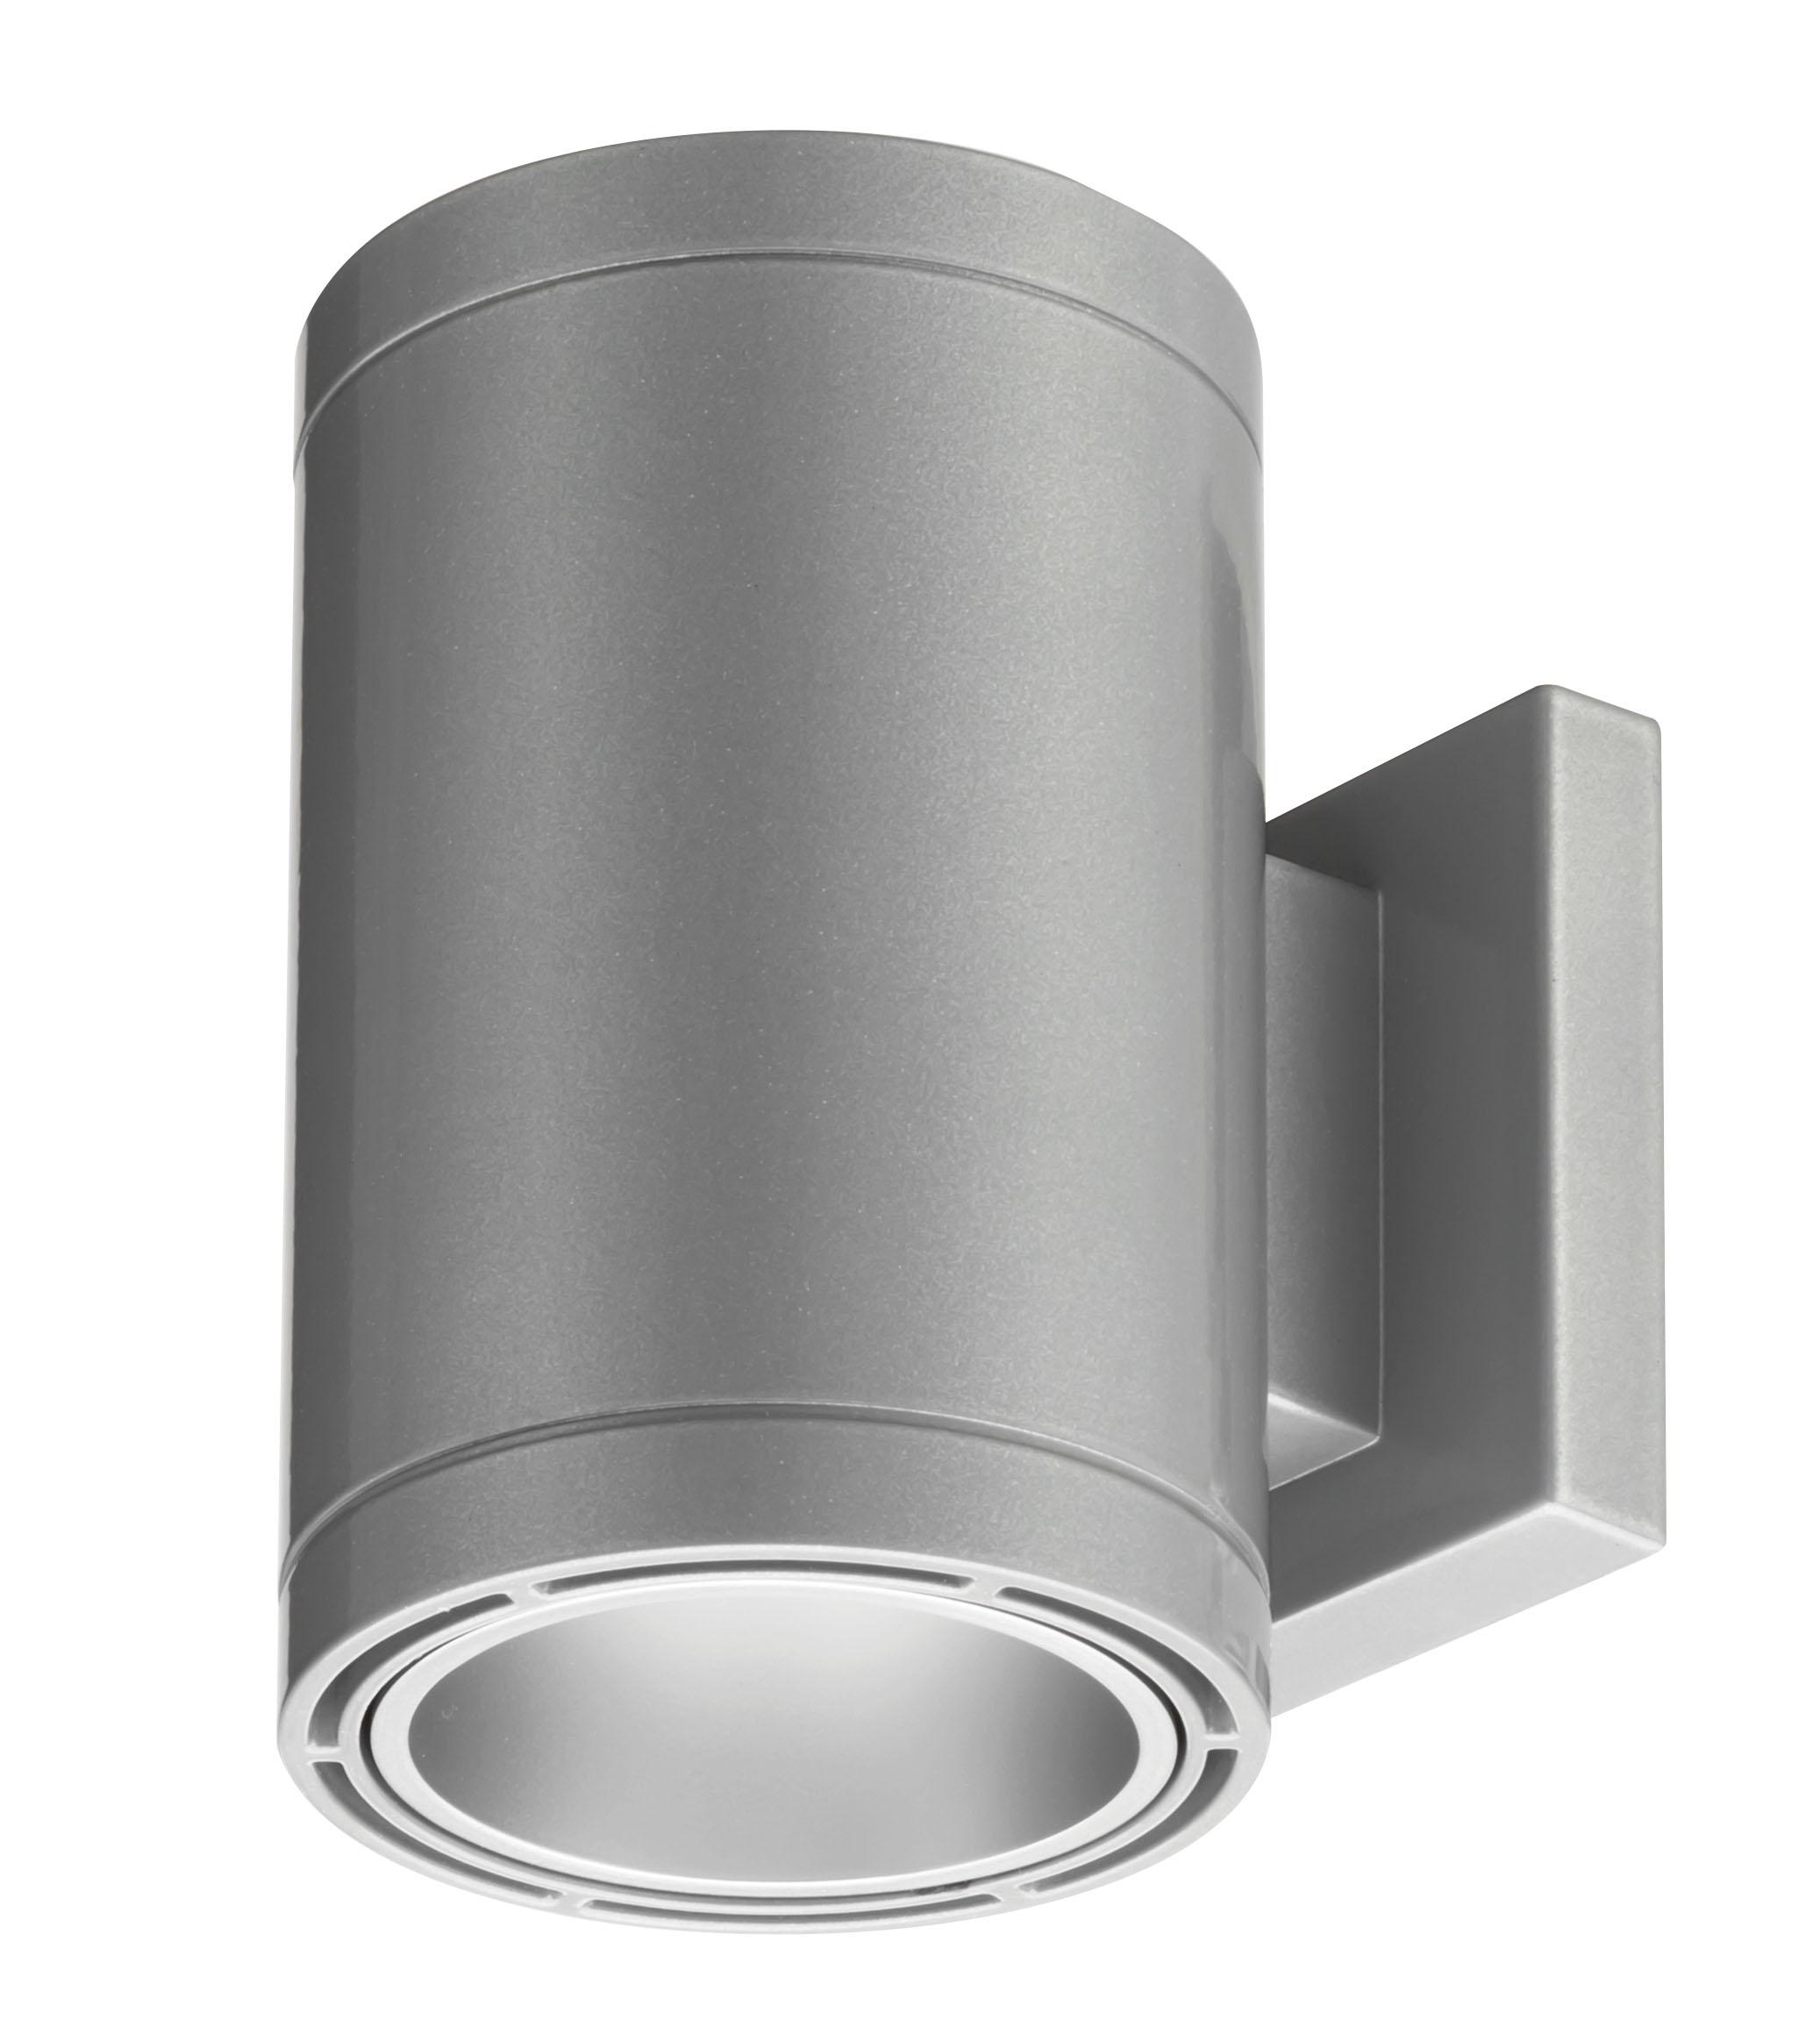 incitocylinder_ico-cyl-35-15-2ar-ld-15d-mvolt-ugz-wm-dna-not-illuminated_jpg.jpg